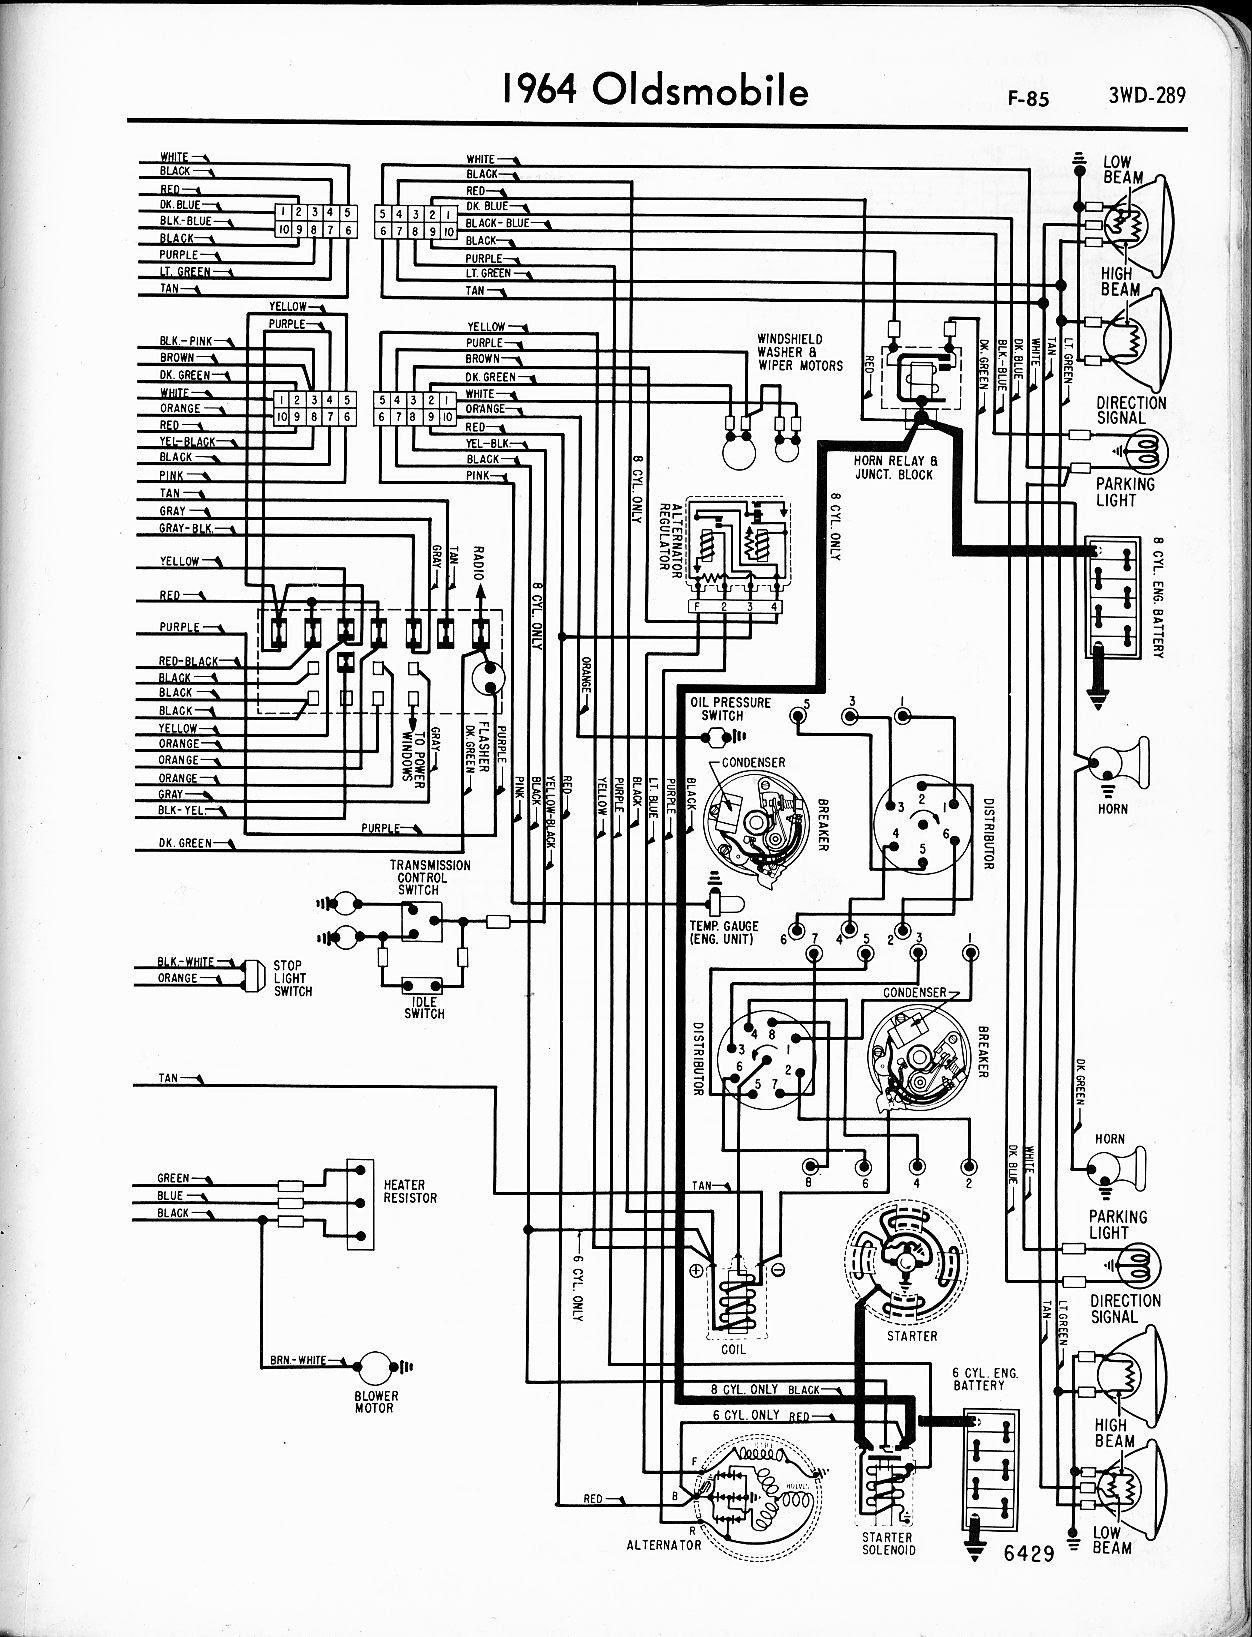 Oldsmobile Alero Wiring Diagram 2000 Cadillac Sls Seville Wiring Diagram Fuses Boxs Audi A3 Jeanjaures37 Fr